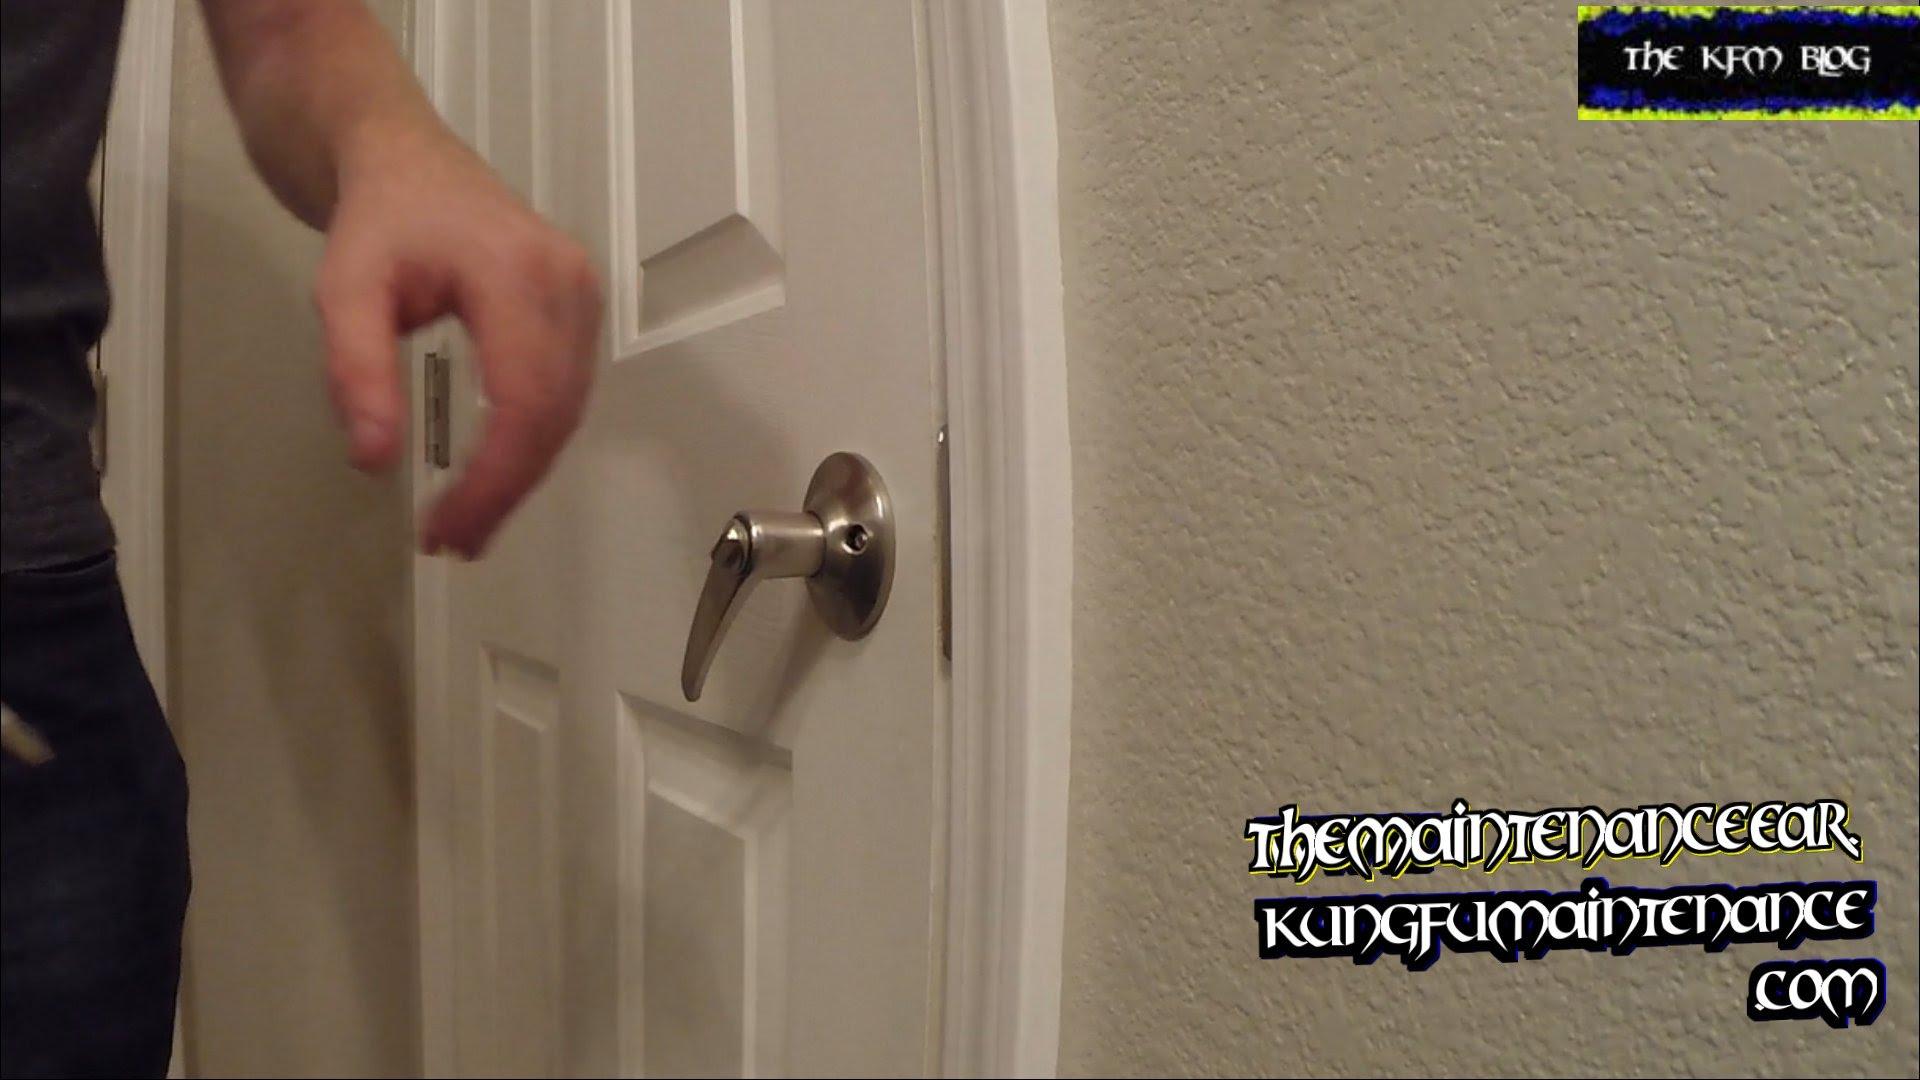 Door Lock Handle Sagging Has Lost Its Spring Back Qualities Not for measurements 1920 X 1080